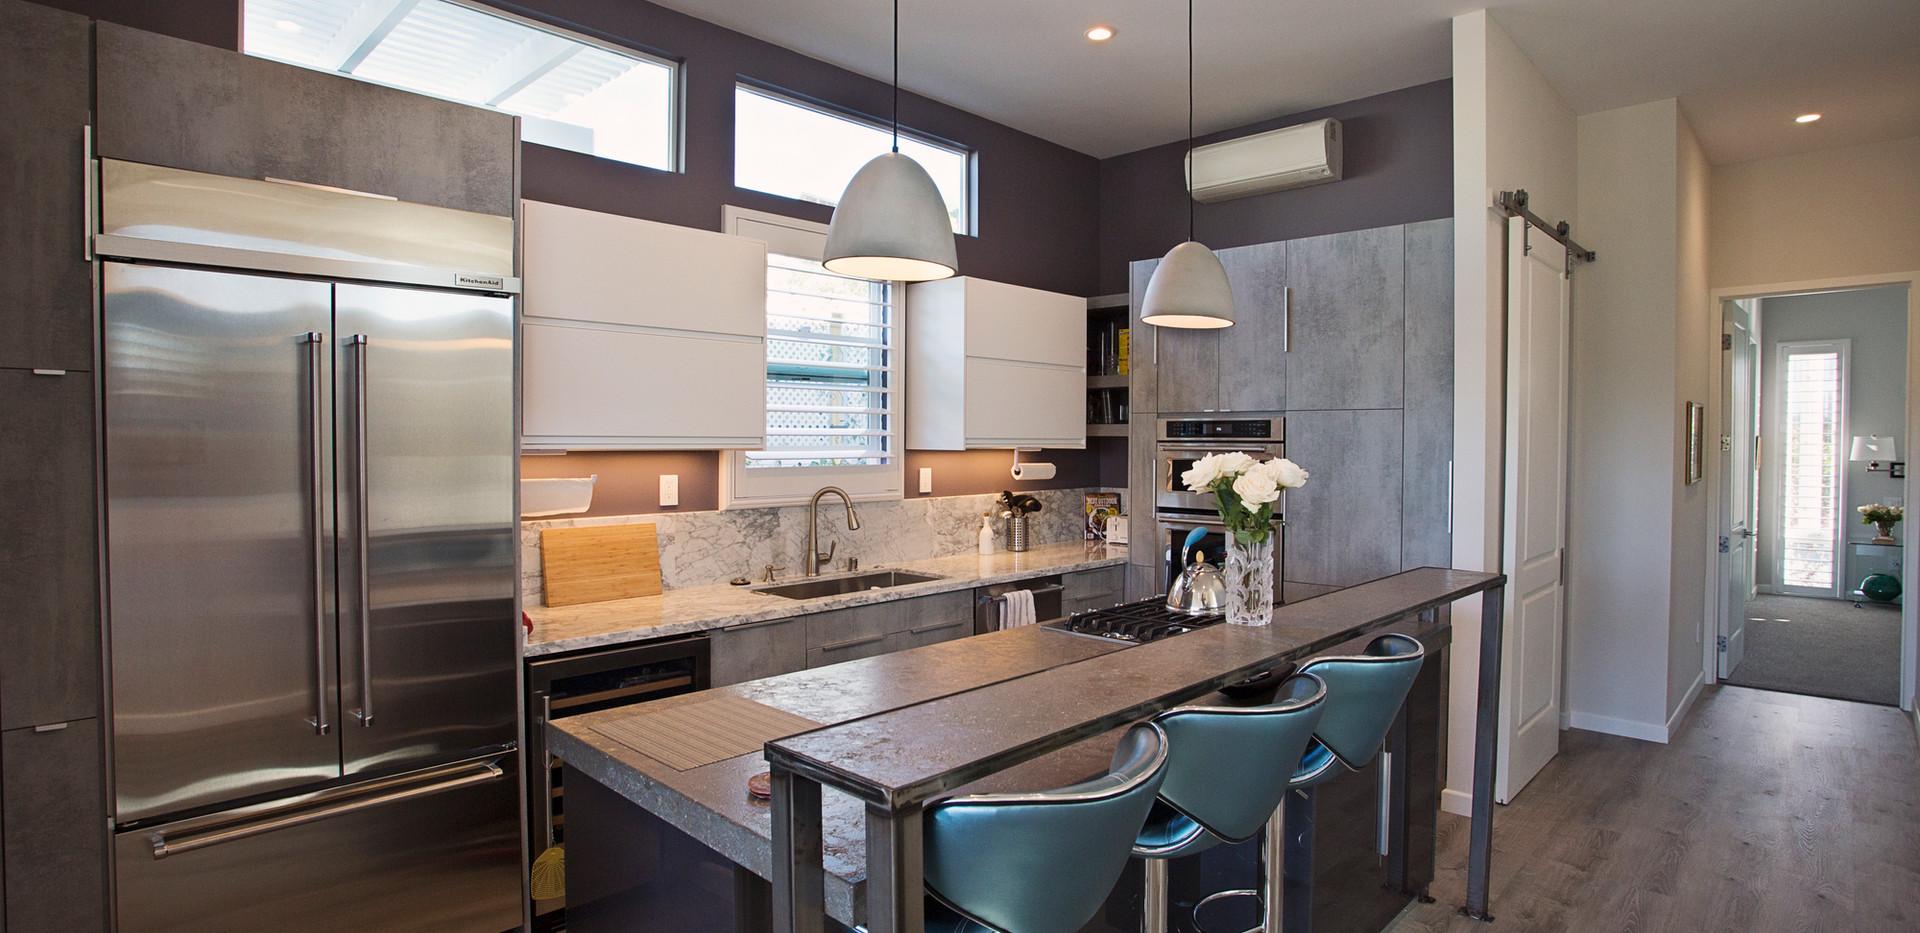 ductless-split-unit-kitchen.jpg